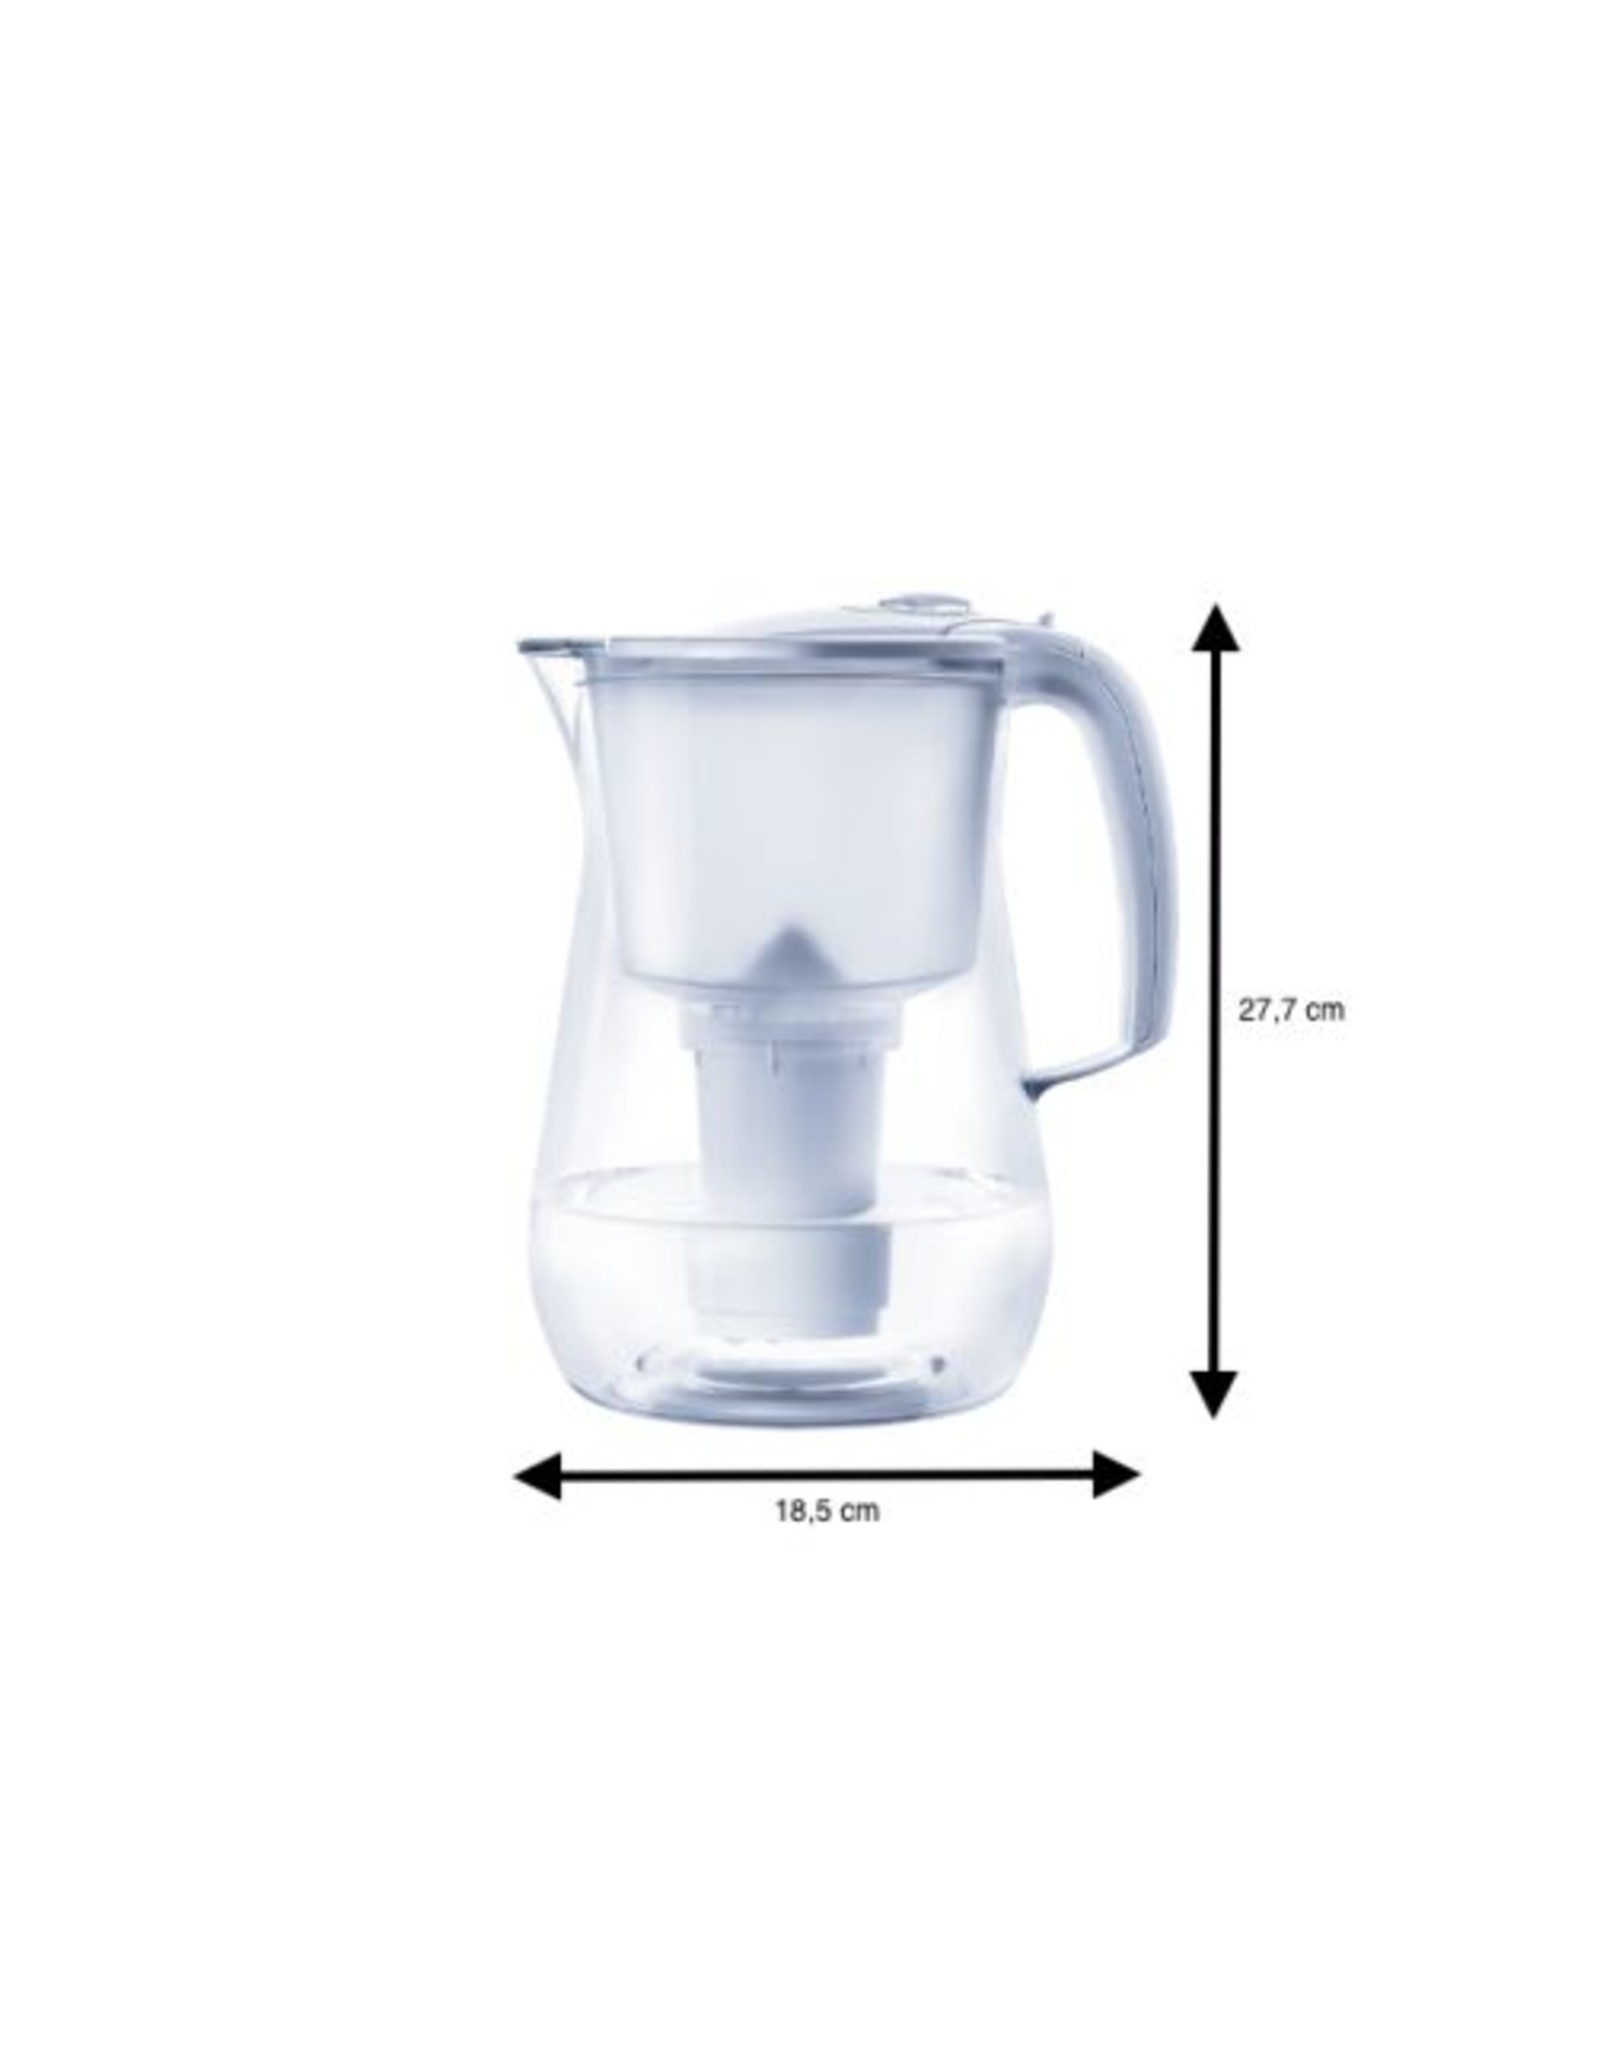 Flow Two Filterkanne / 4.2 L / 2-4 Personen Haushalt